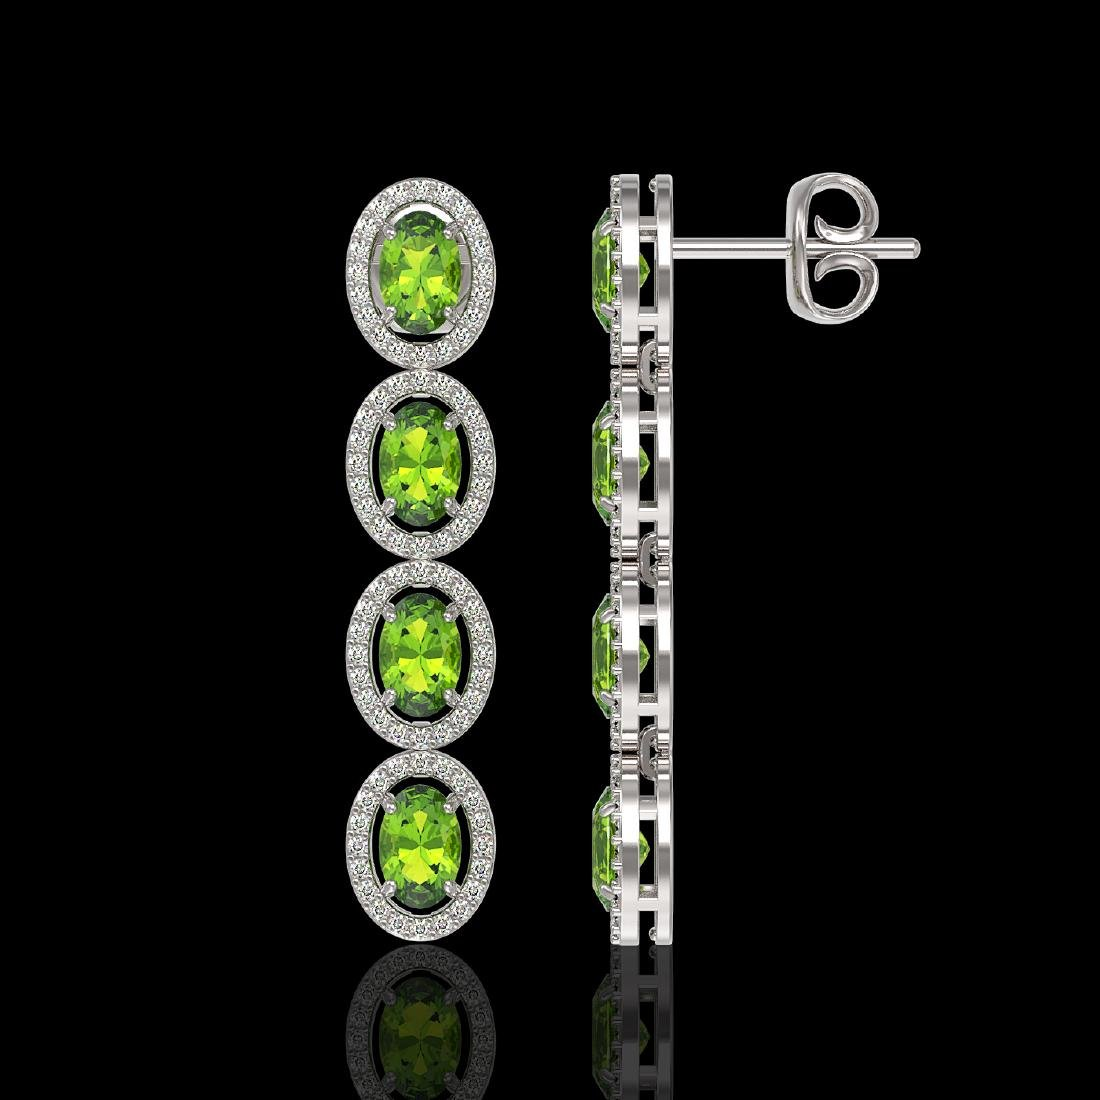 5.88 CTW Peridot & Diamond Halo Earrings 10K White Gold - 2